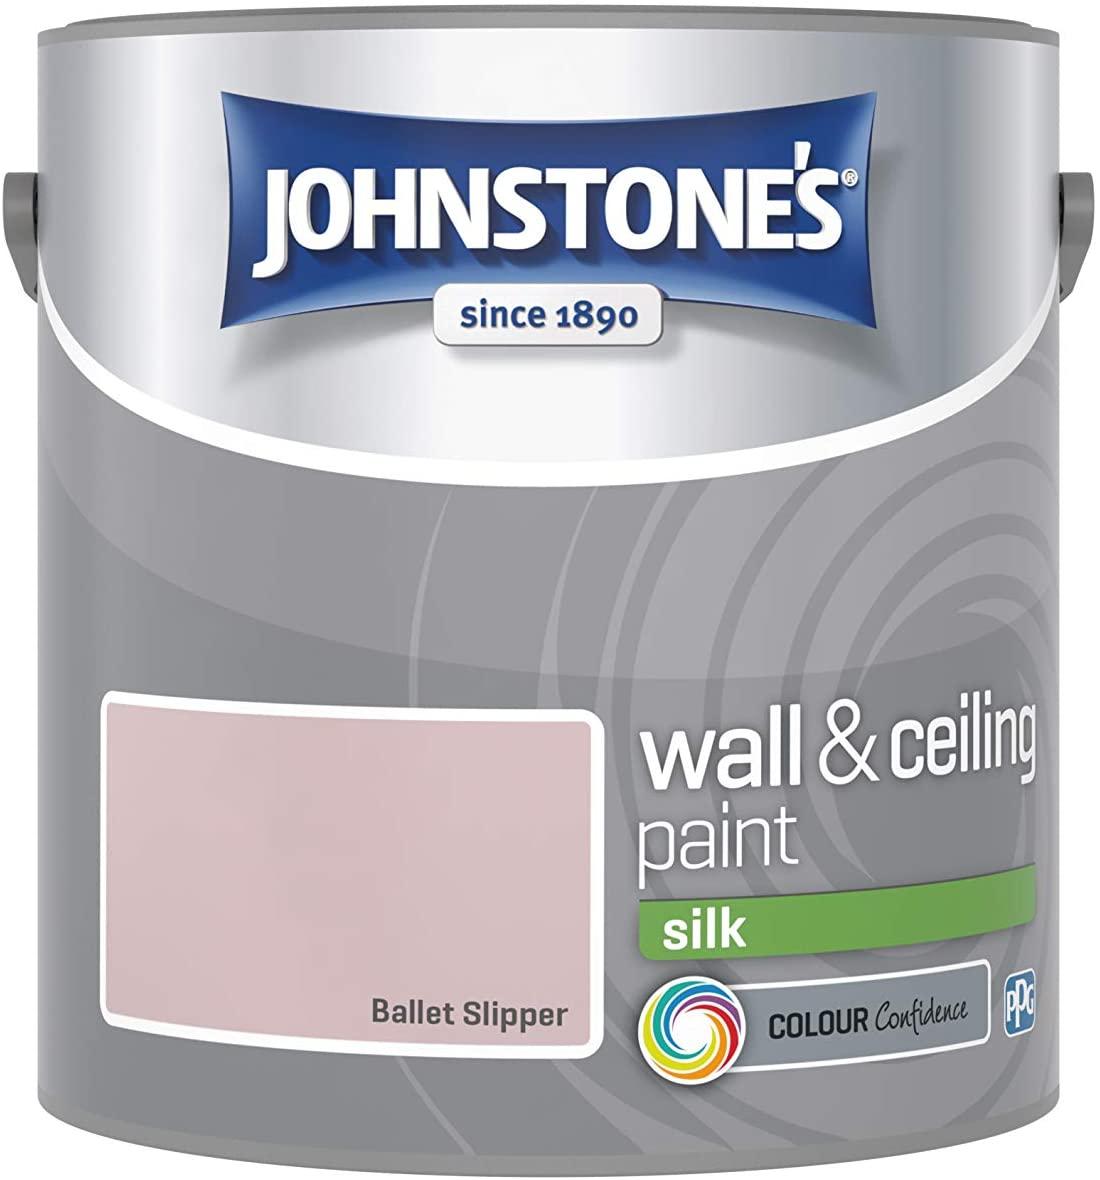 Johnstone's Paint 2.5L - Various Colours, Silk & Matt - 8p instore at Asda Langley Mill